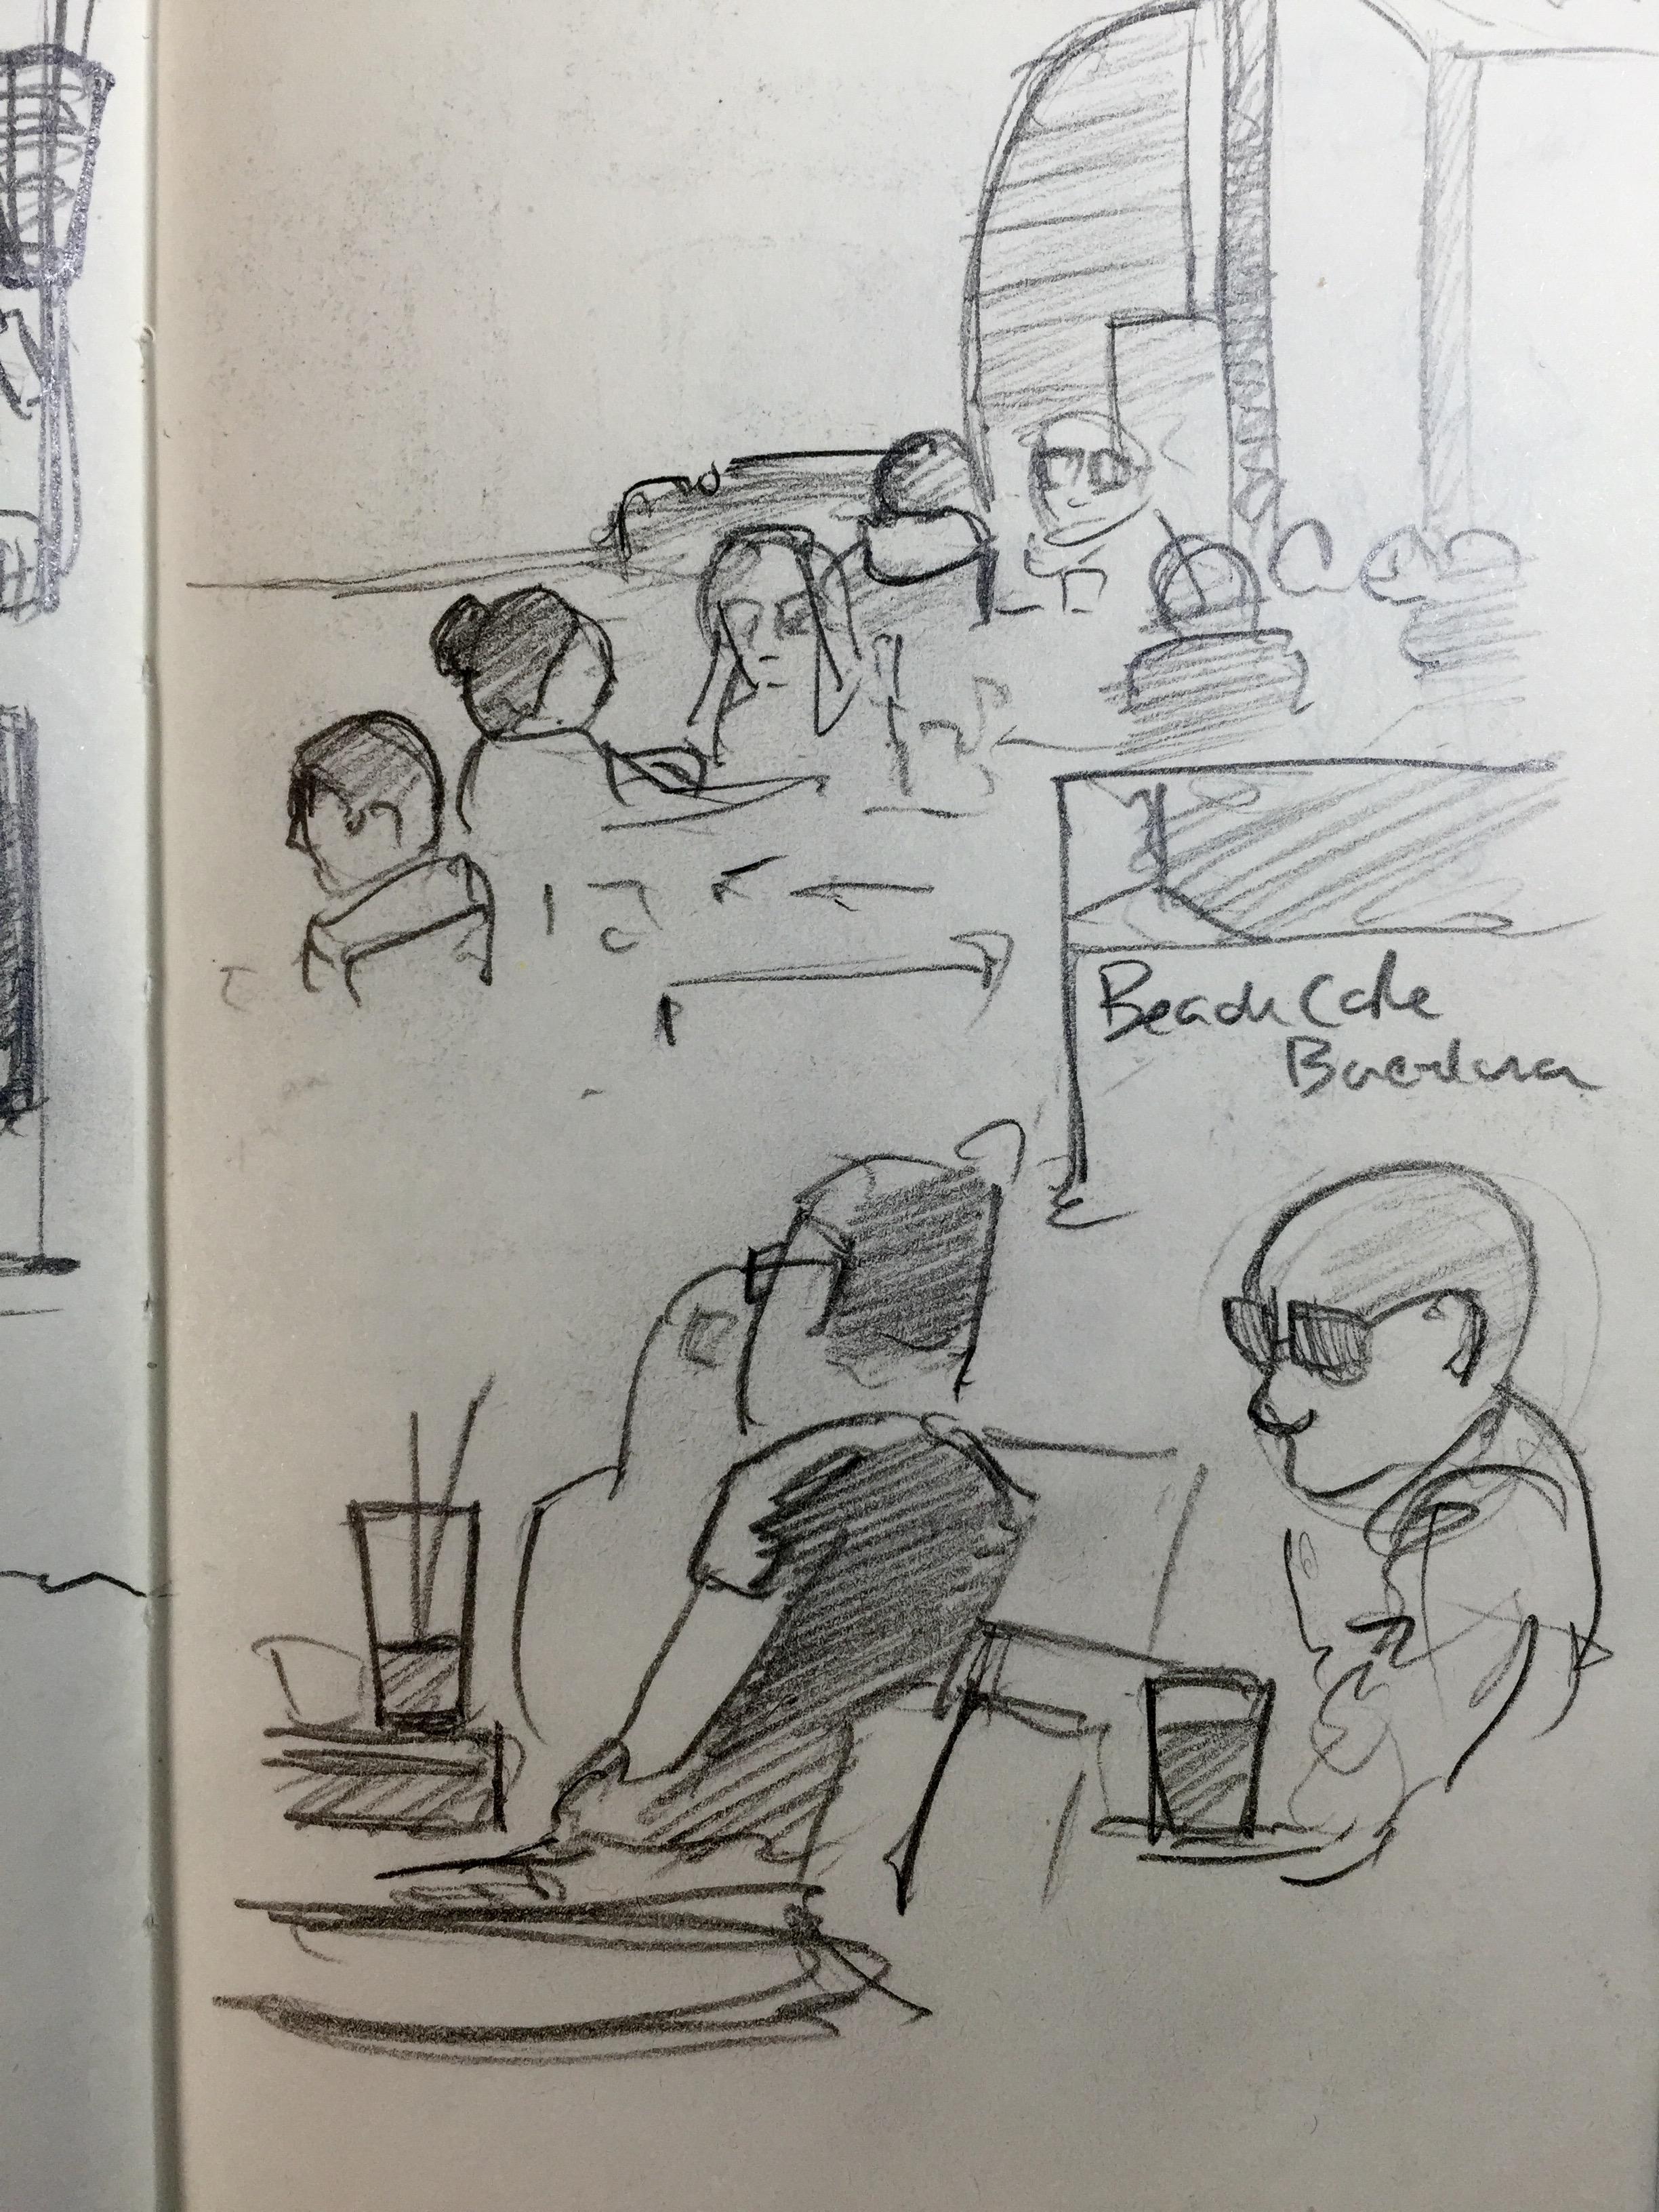 Others enjoying the brisk beach